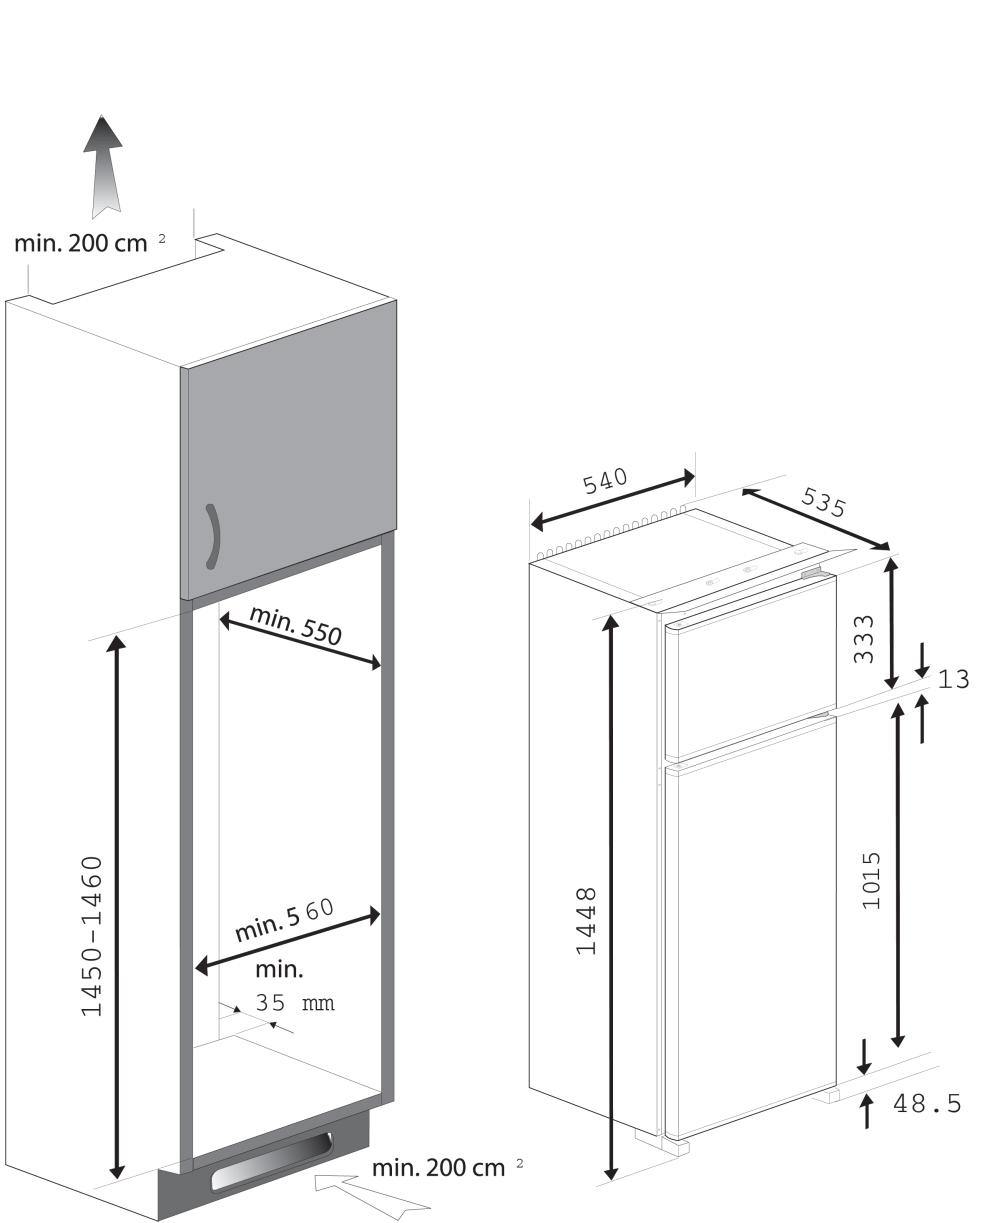 informationsseite h ttich beko rbi 6301 einbau k hl. Black Bedroom Furniture Sets. Home Design Ideas